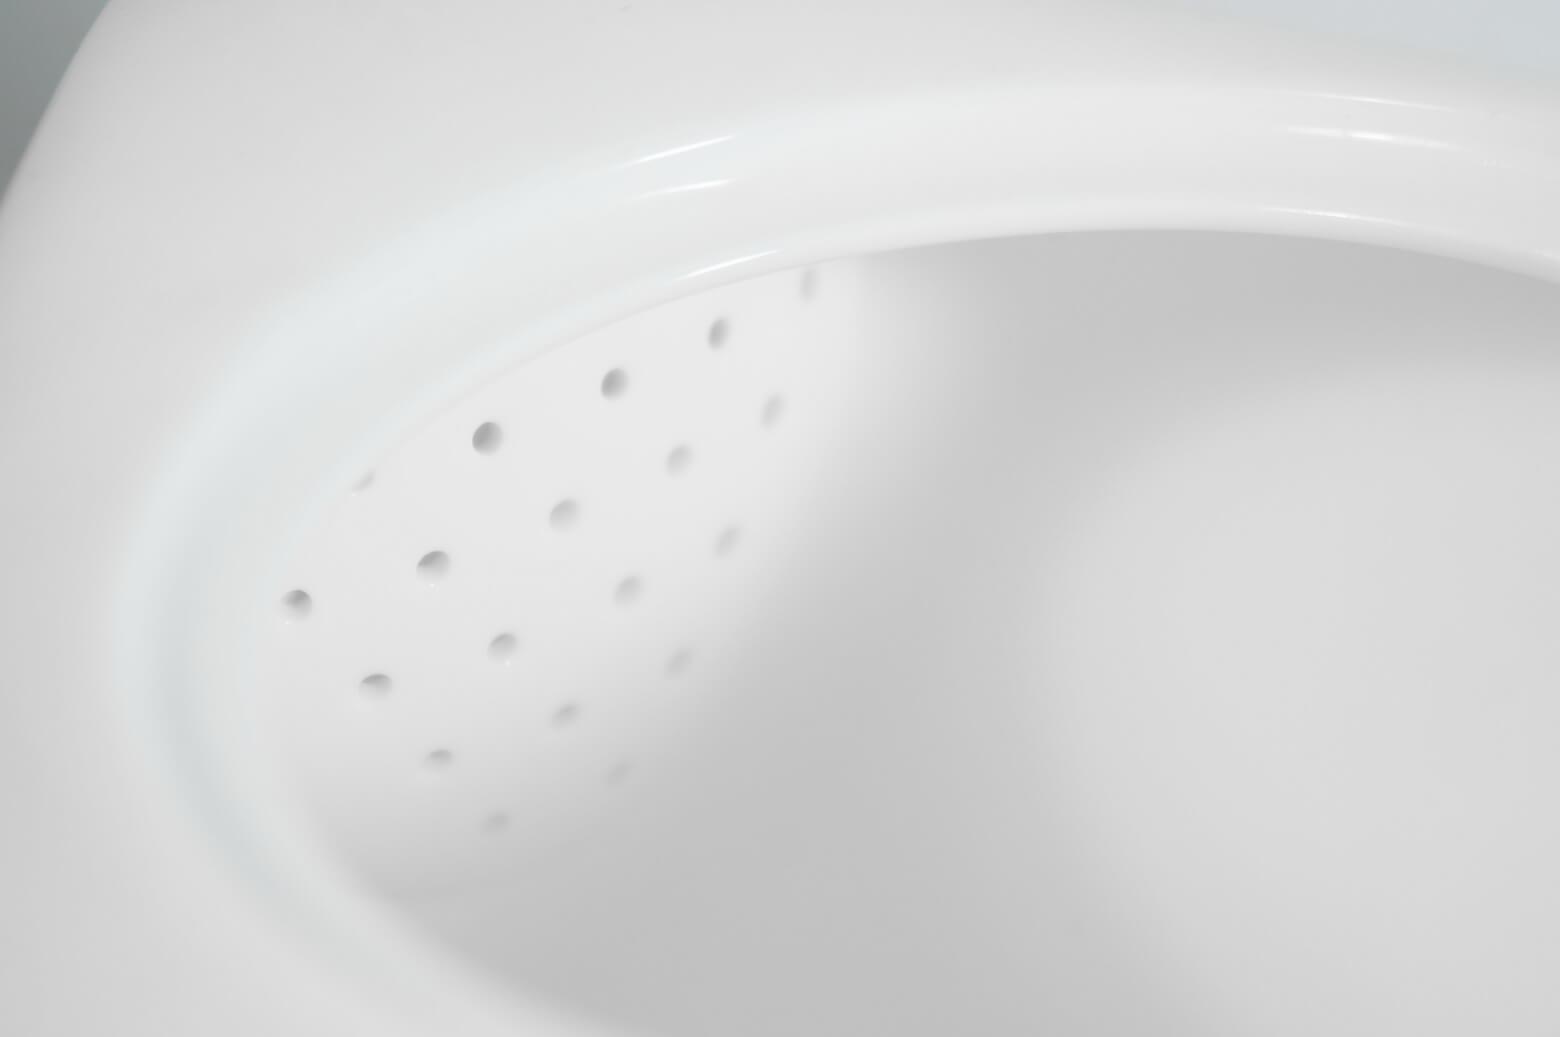 NIKKO Tea Pot designed by Sori Yanagi/ニッコー ティーポット 柳宗理 デザイン